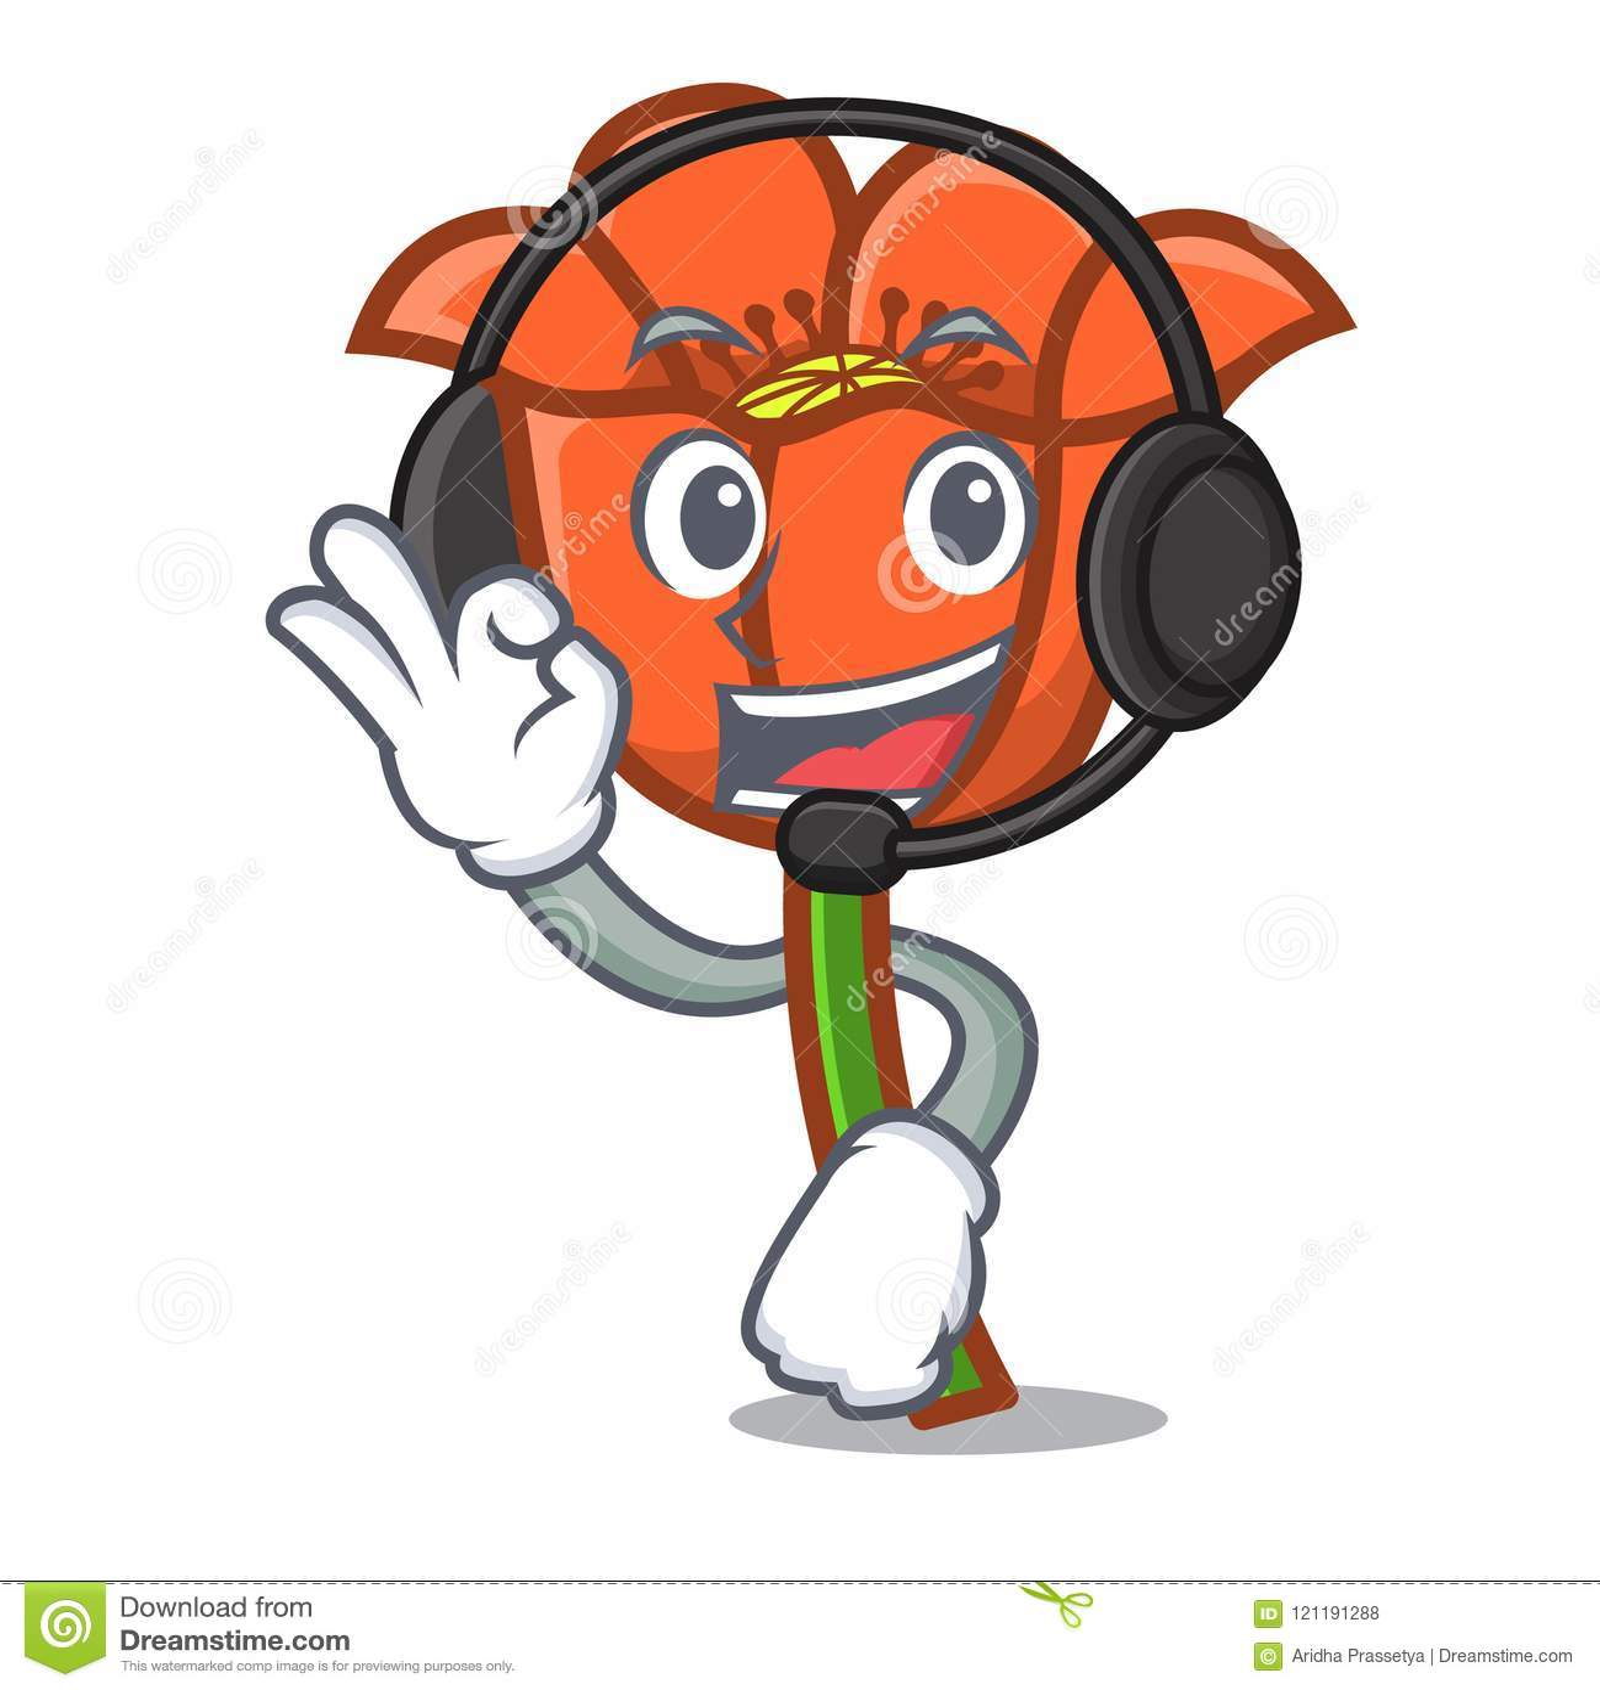 With Headphone Poppy Flower Mascot Cartoon Stock Vector